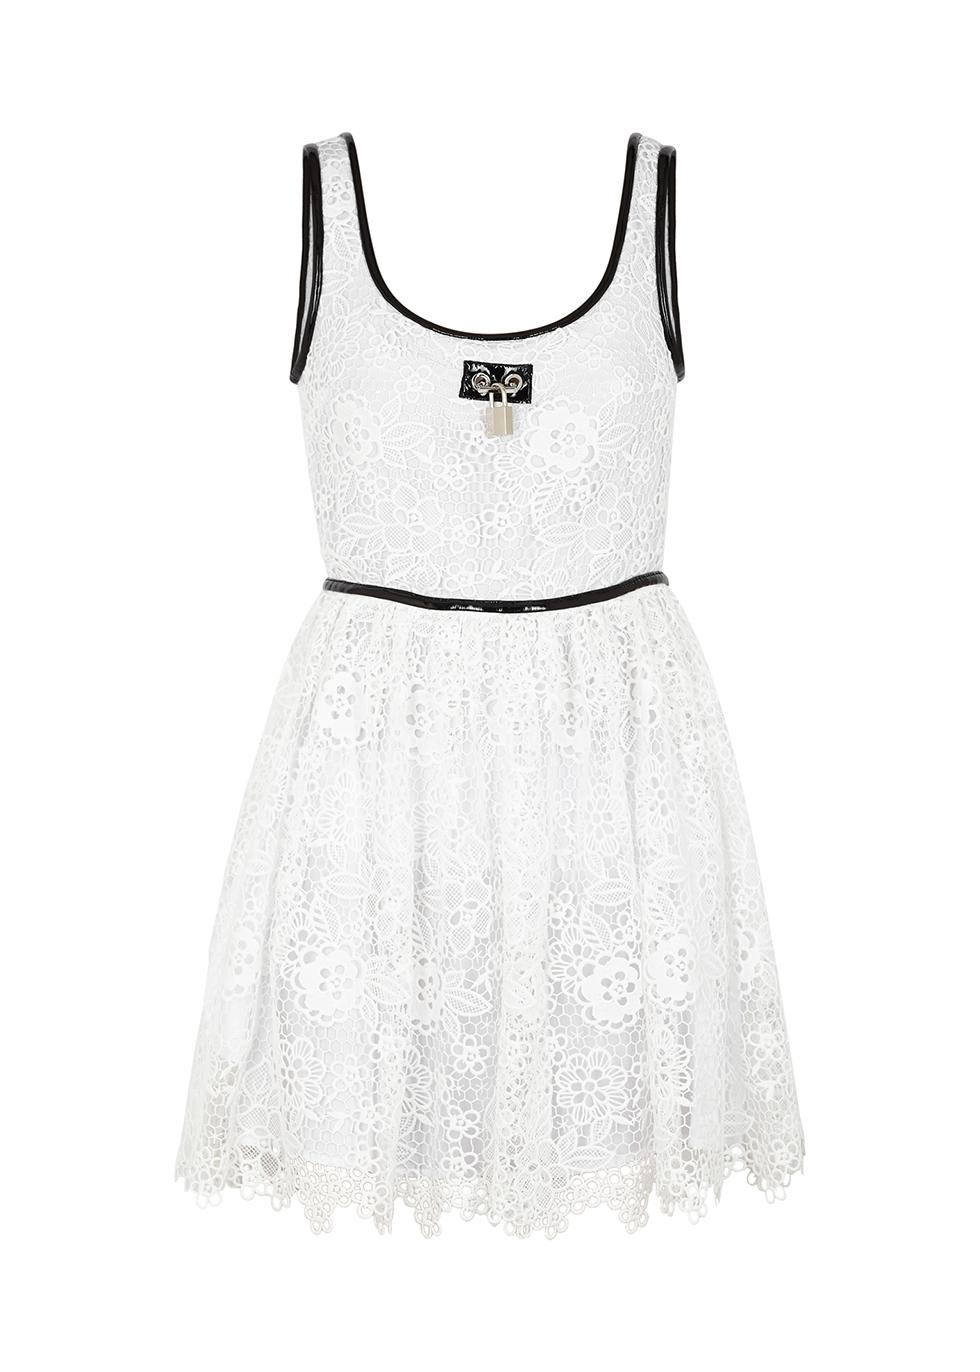 White broderie anglaise mini dress